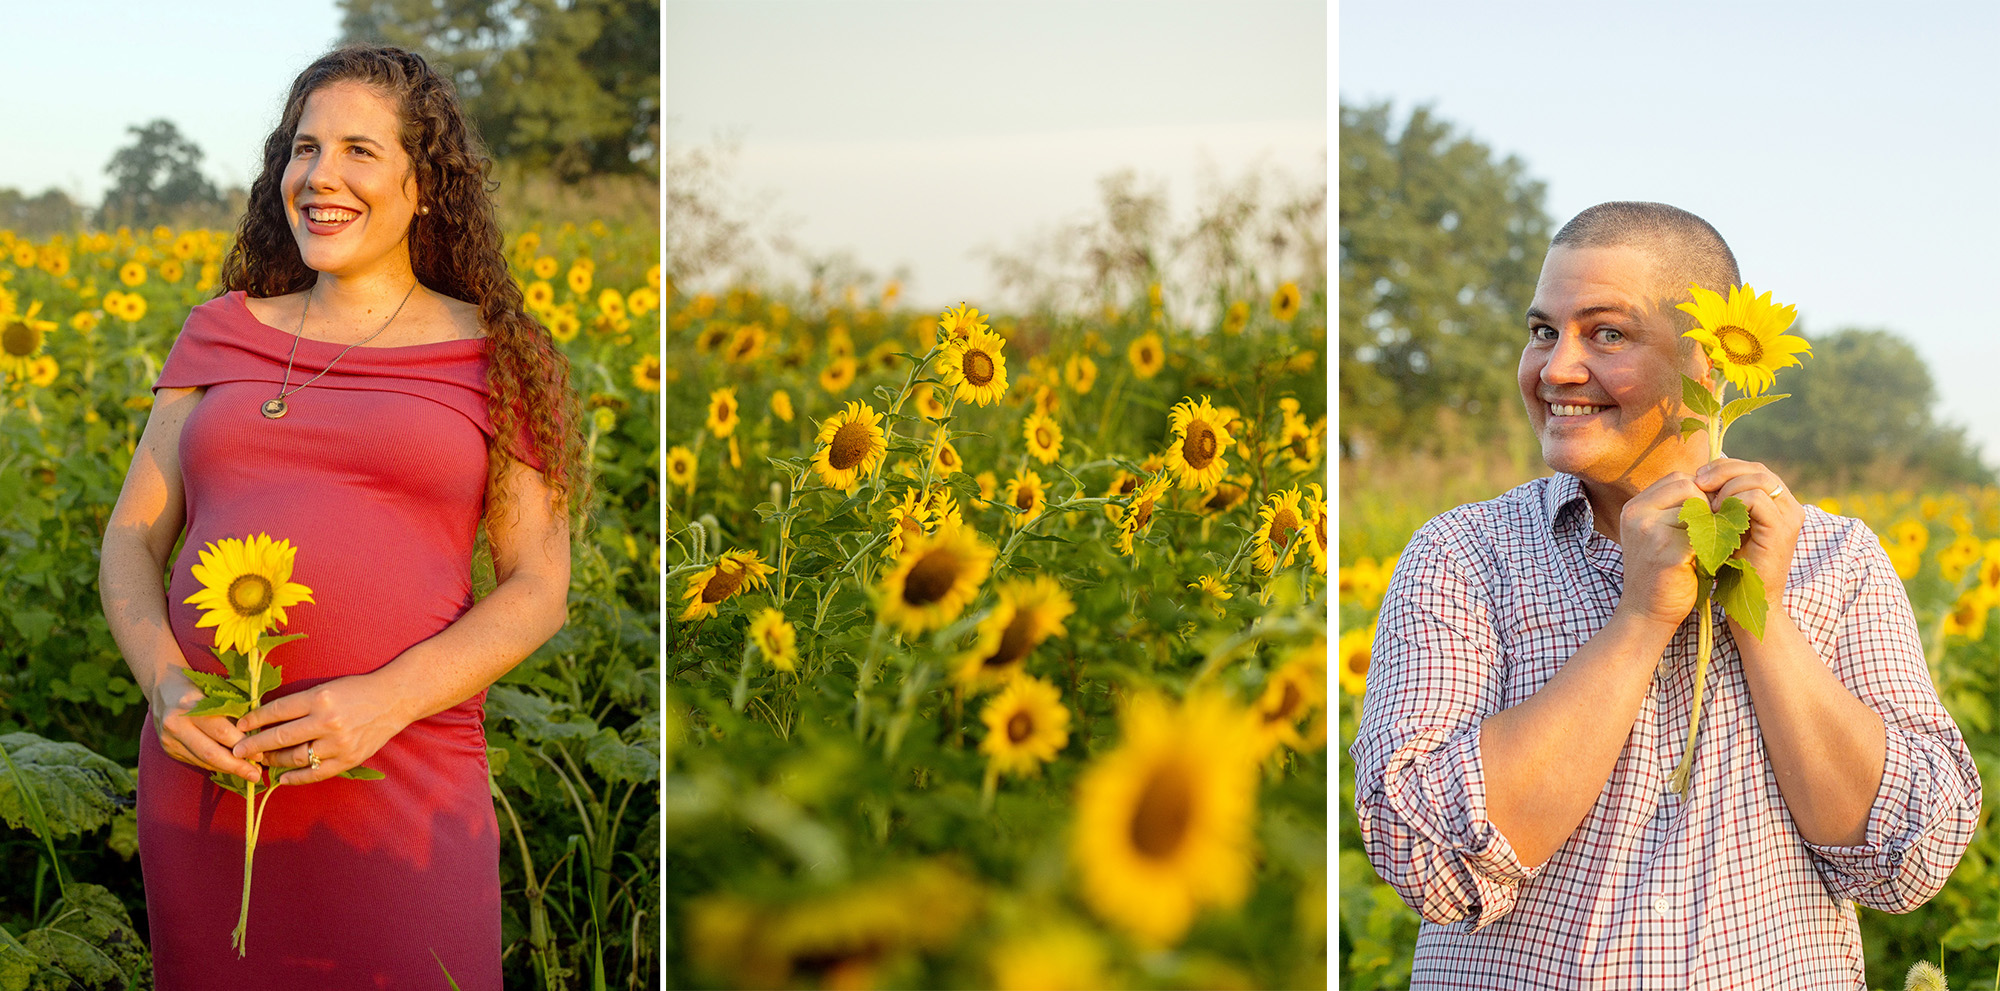 Seriously_Sabrina_Photography_Lexington_Frankfort_Kentucky_Maternity_Mini_Sunflowers_Johns18.jpg